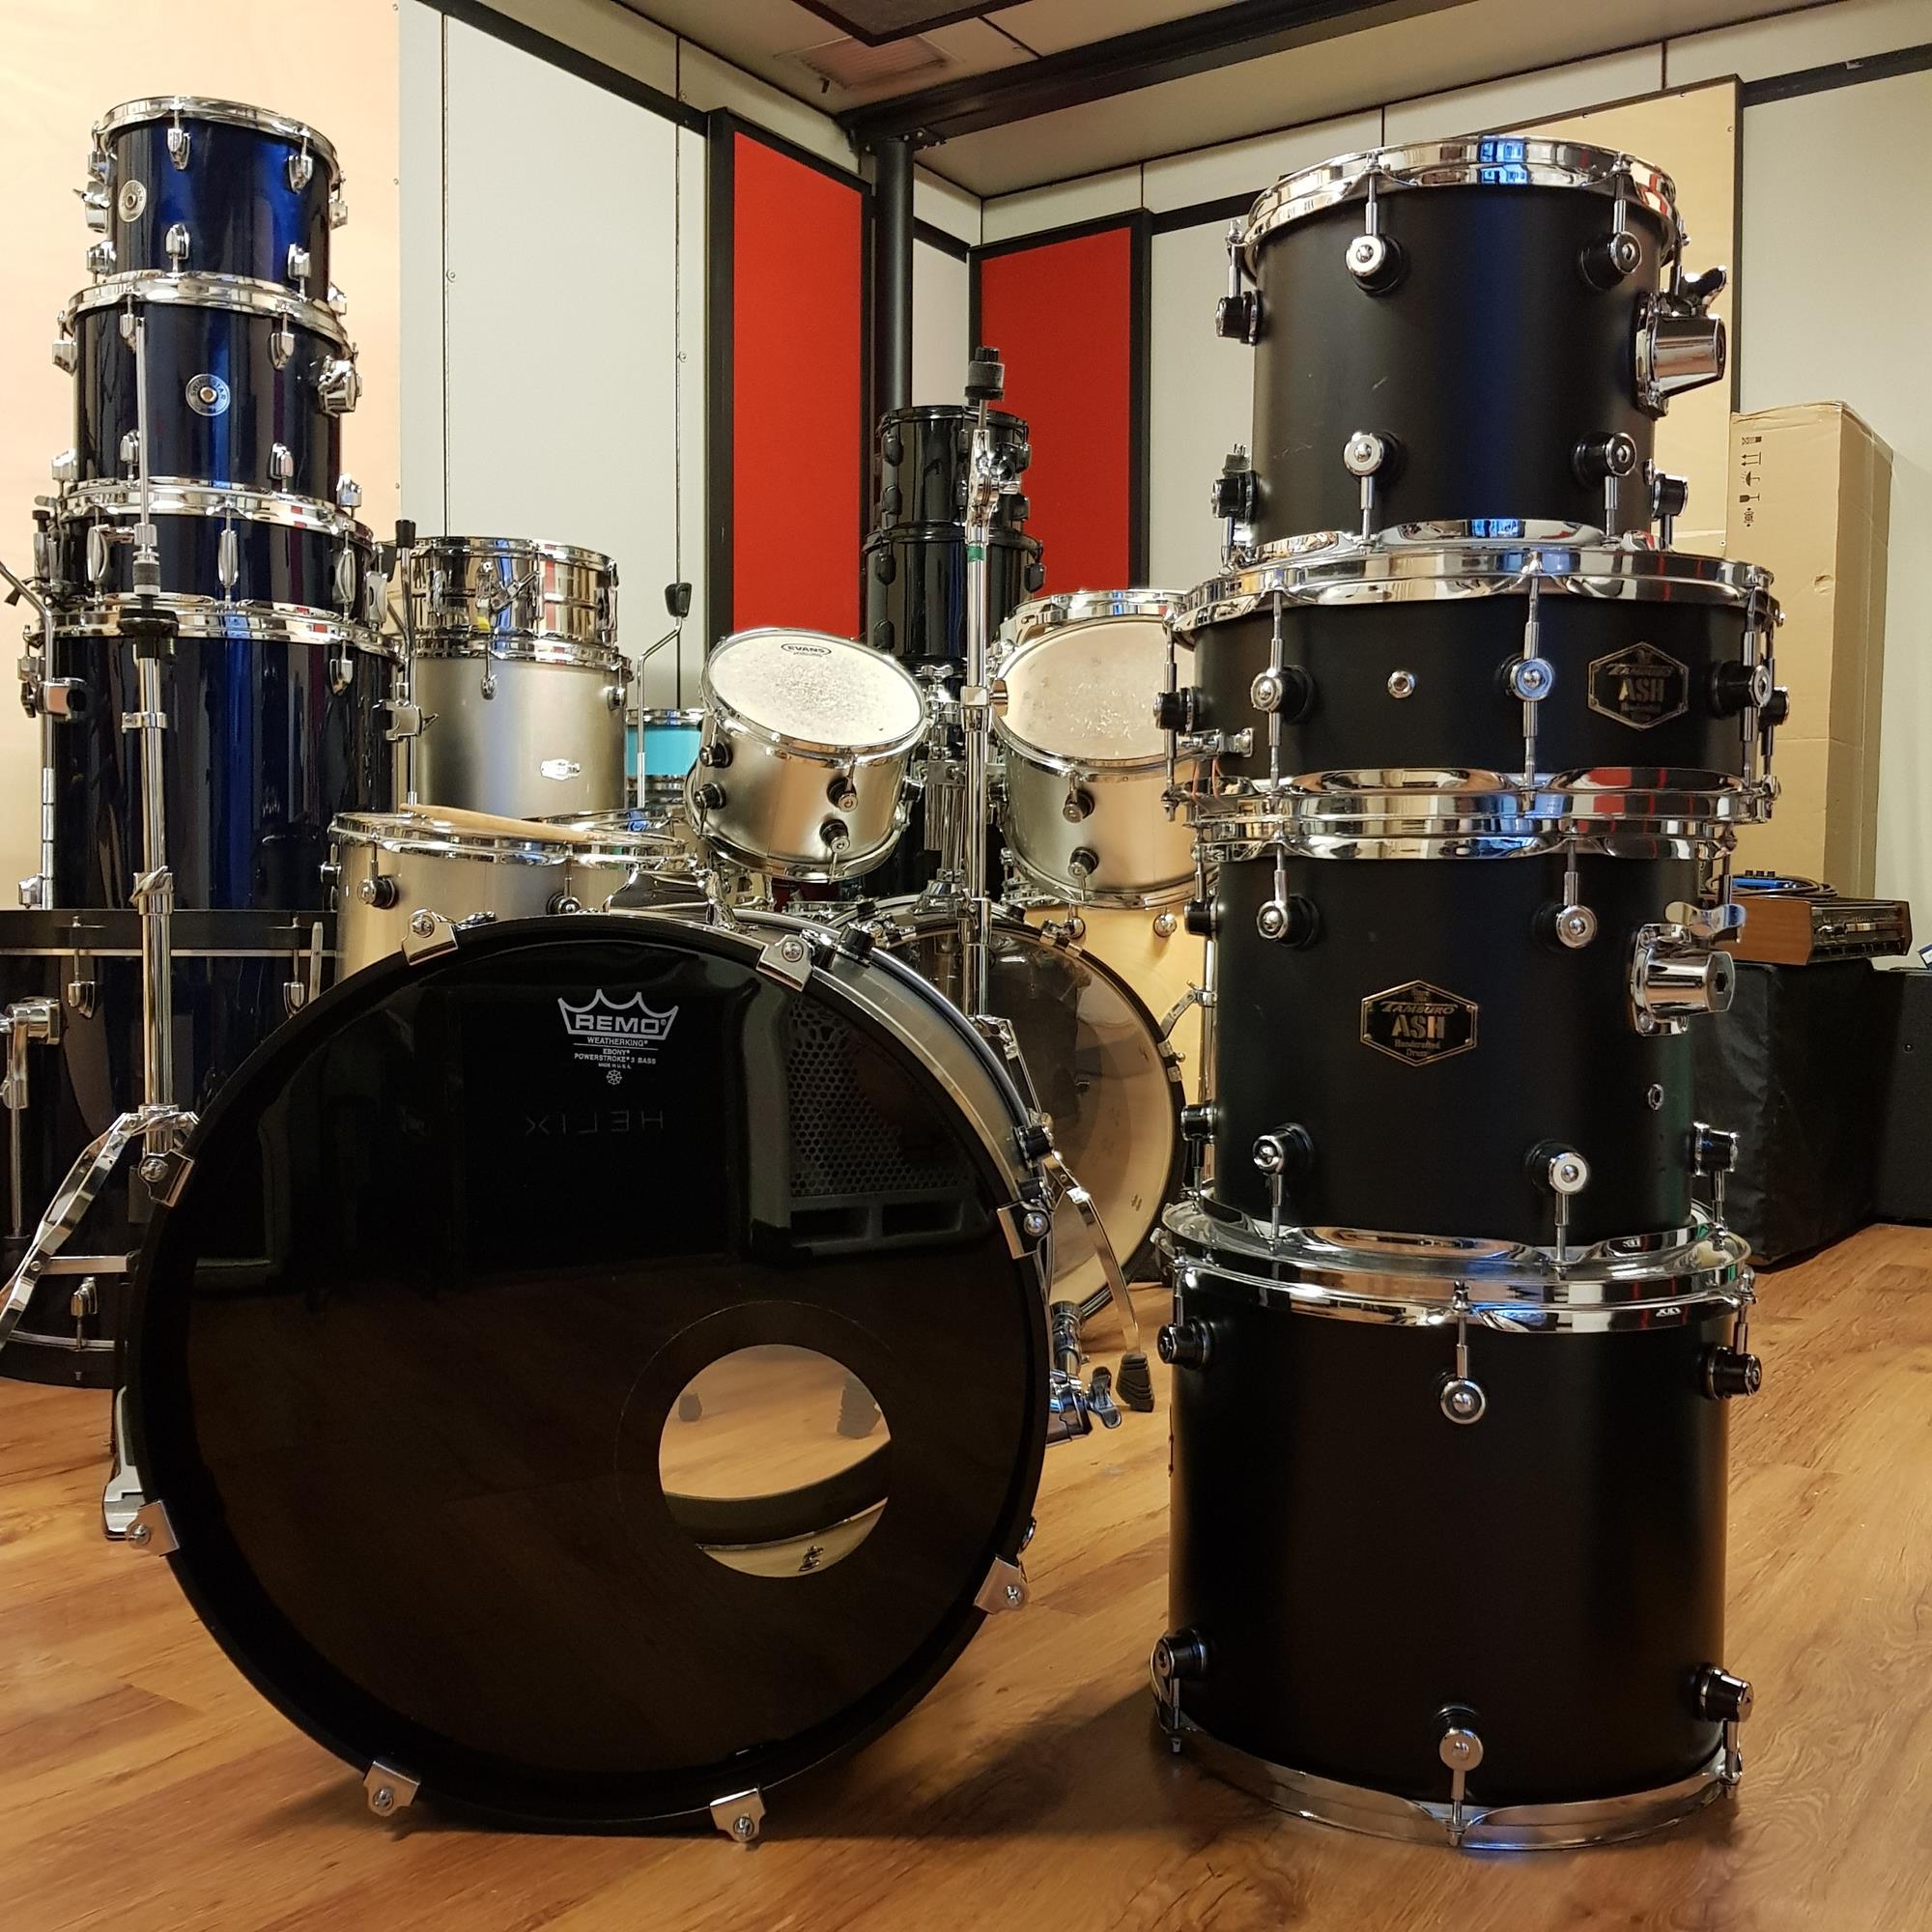 TAMBURO ASH SET BLACK MADE IN ITALY - Batterie / Percussioni Batterie - Batterie Acustiche (set)